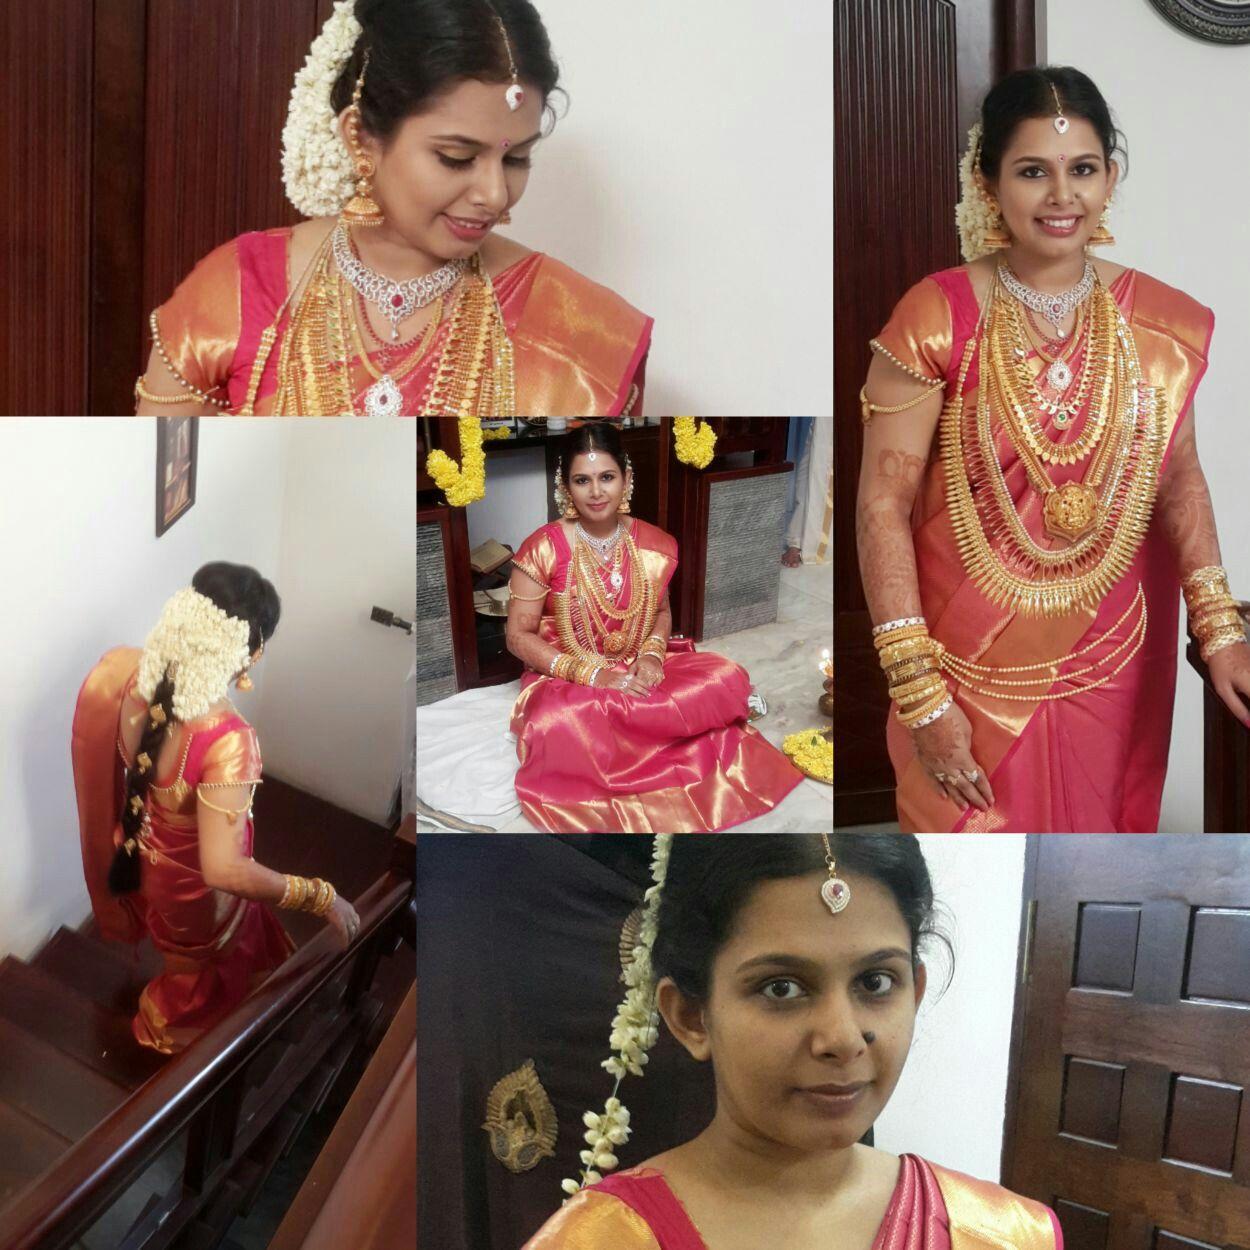 Engagement pattu saree images pin by gomathinayagam on jewellery  pinterest  saree wedding